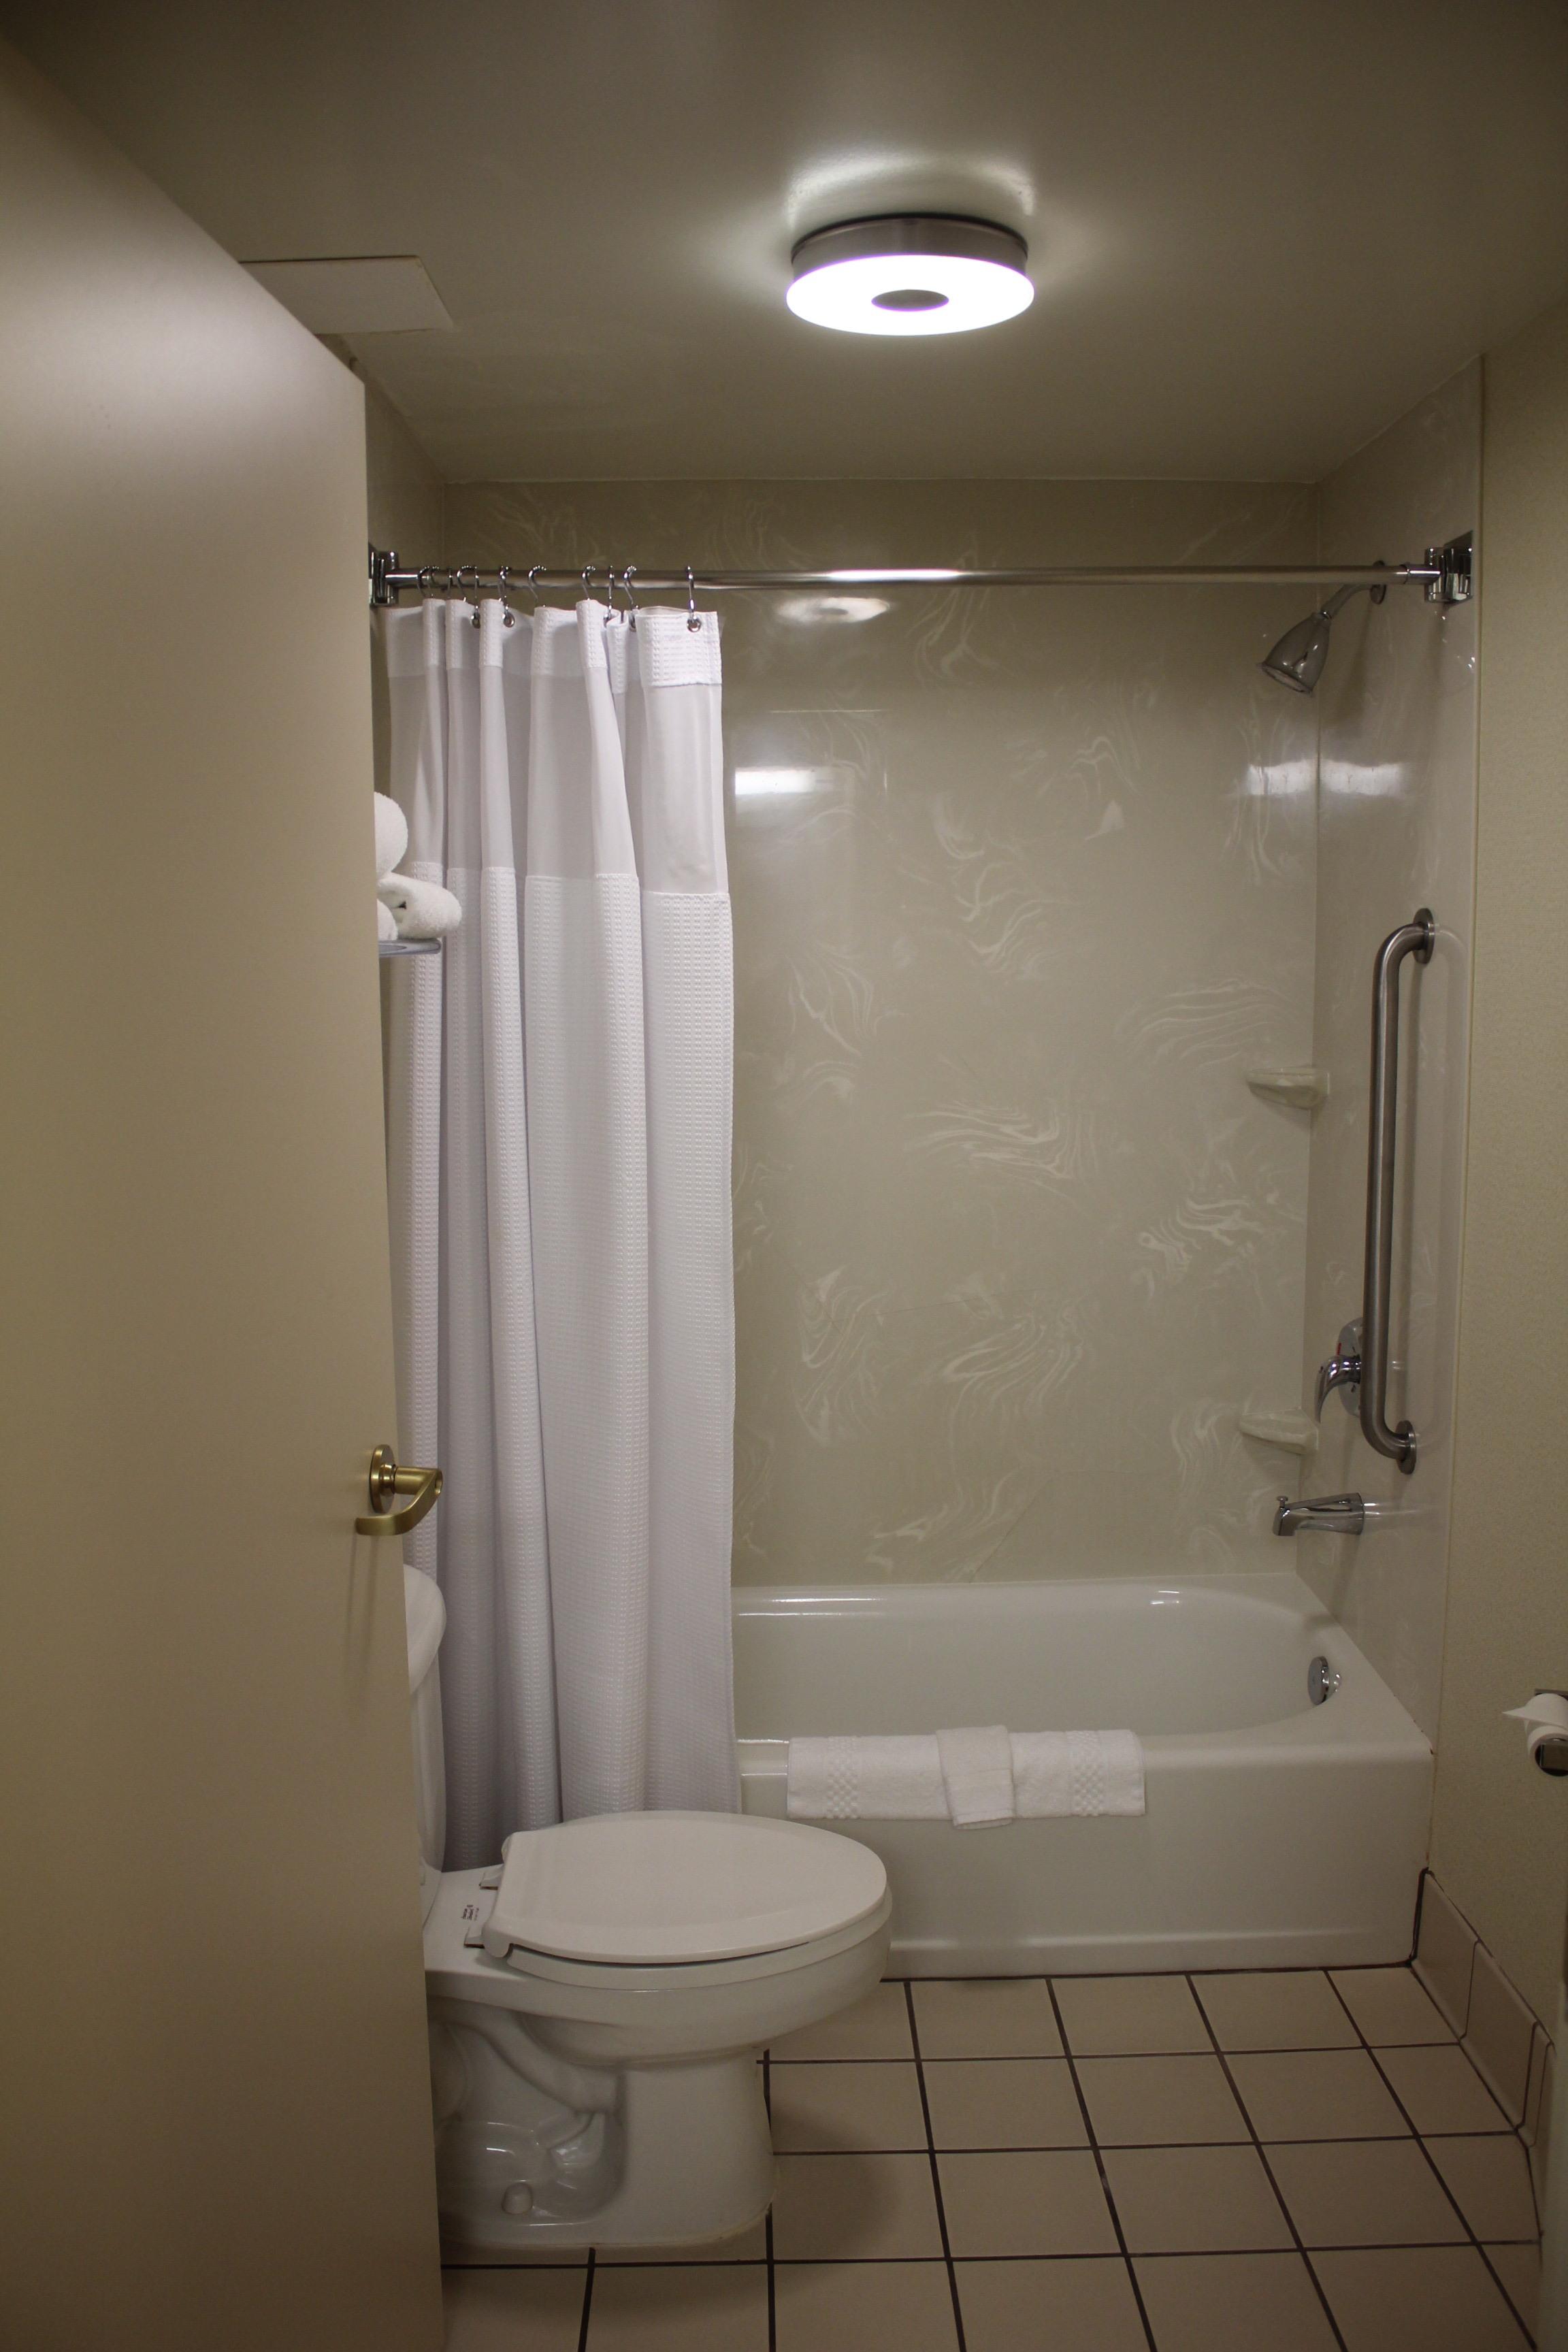 SpringHill Suites Charlotte Airport – Bathroom